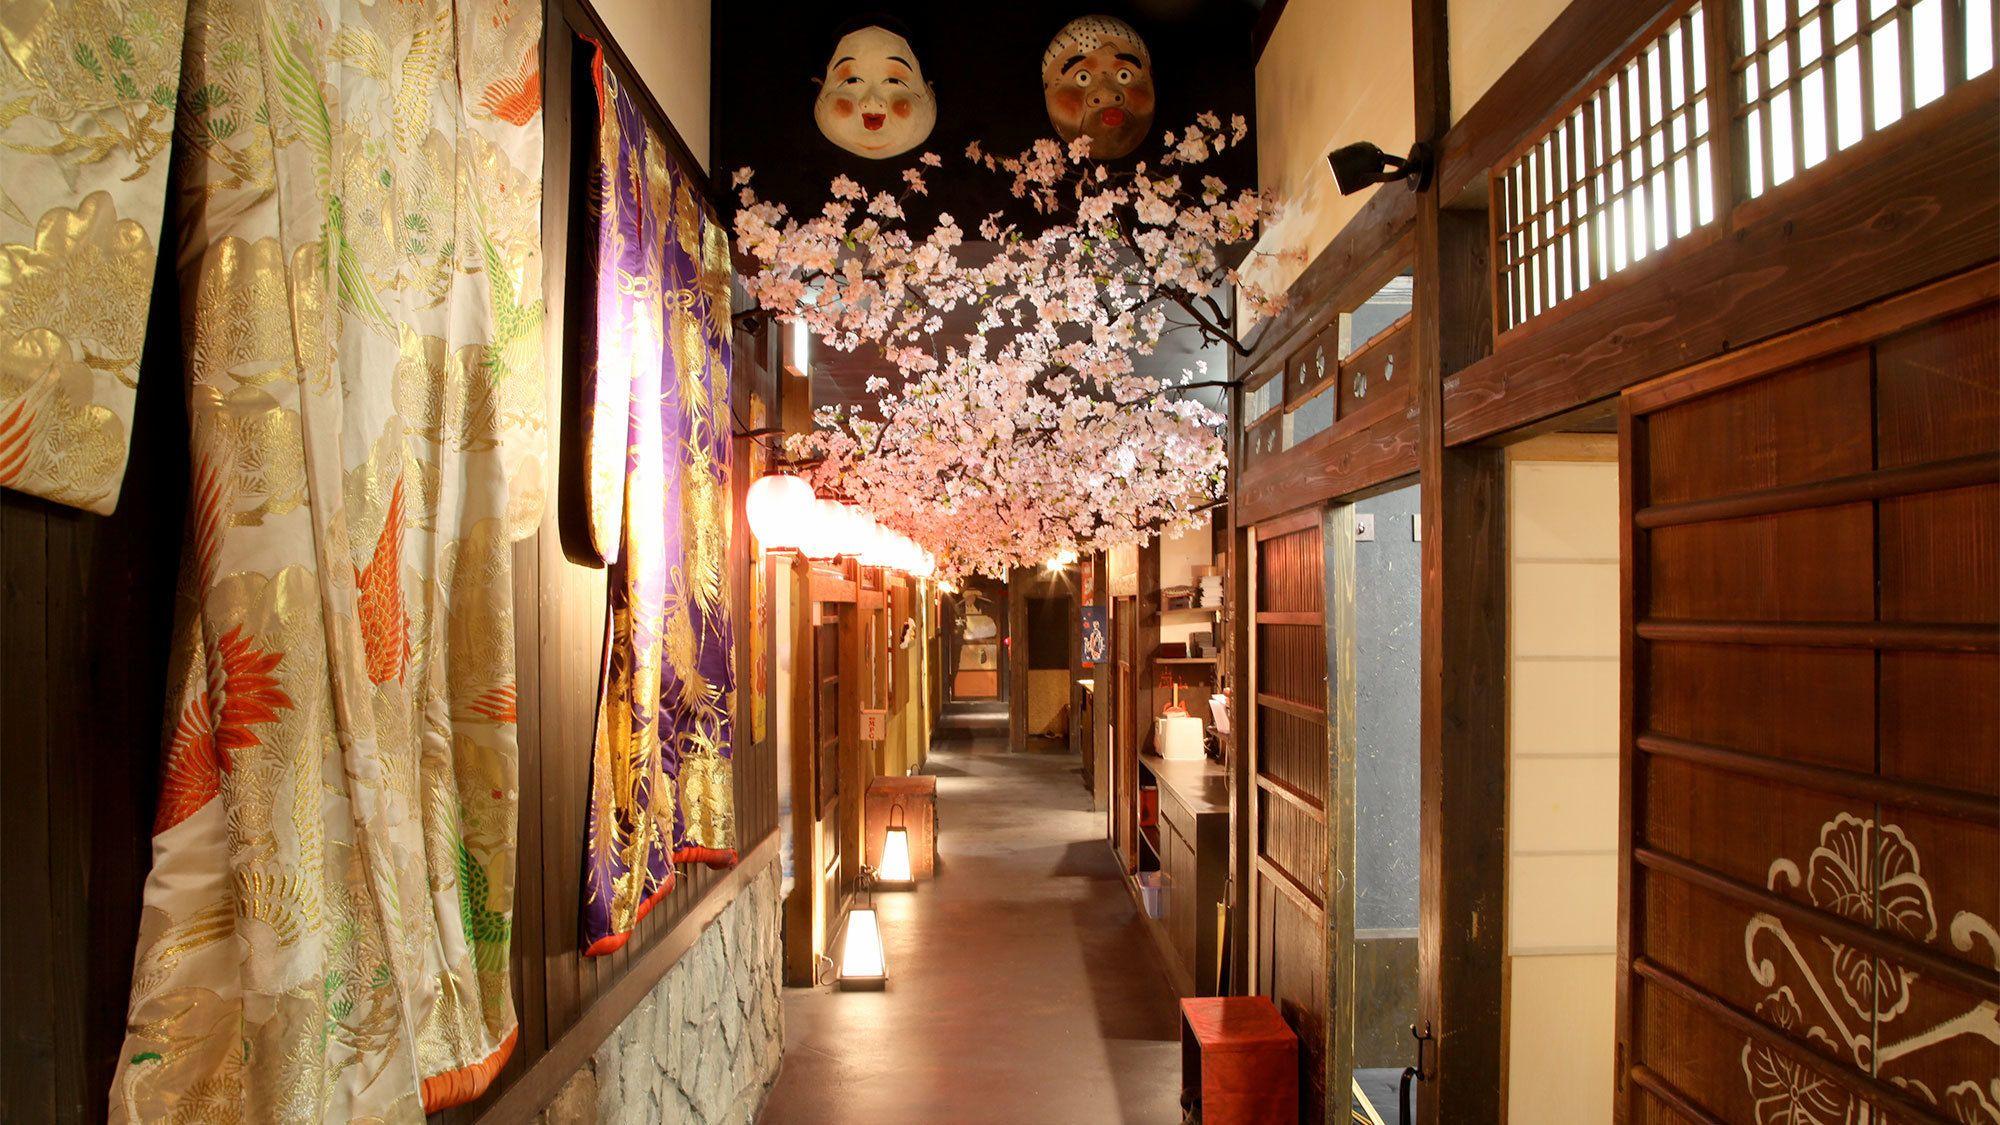 Dinner Course at Kyoto Themed Izakaya Restaurant in Tokyo